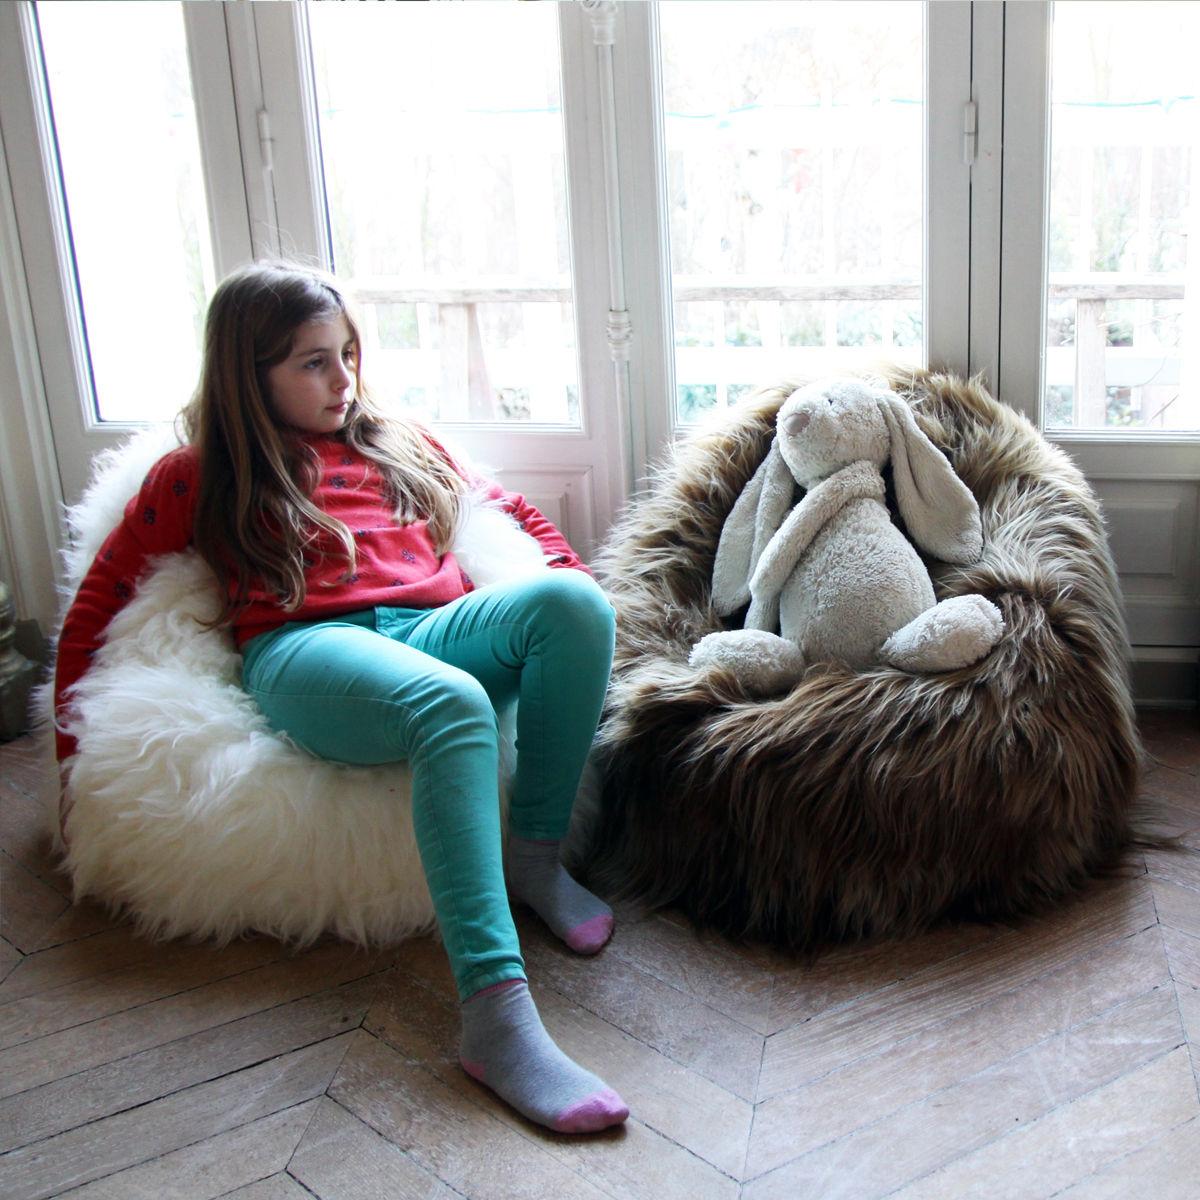 moumoute kid 55 cm echtes schaffell fab design sitzkissen. Black Bedroom Furniture Sets. Home Design Ideas